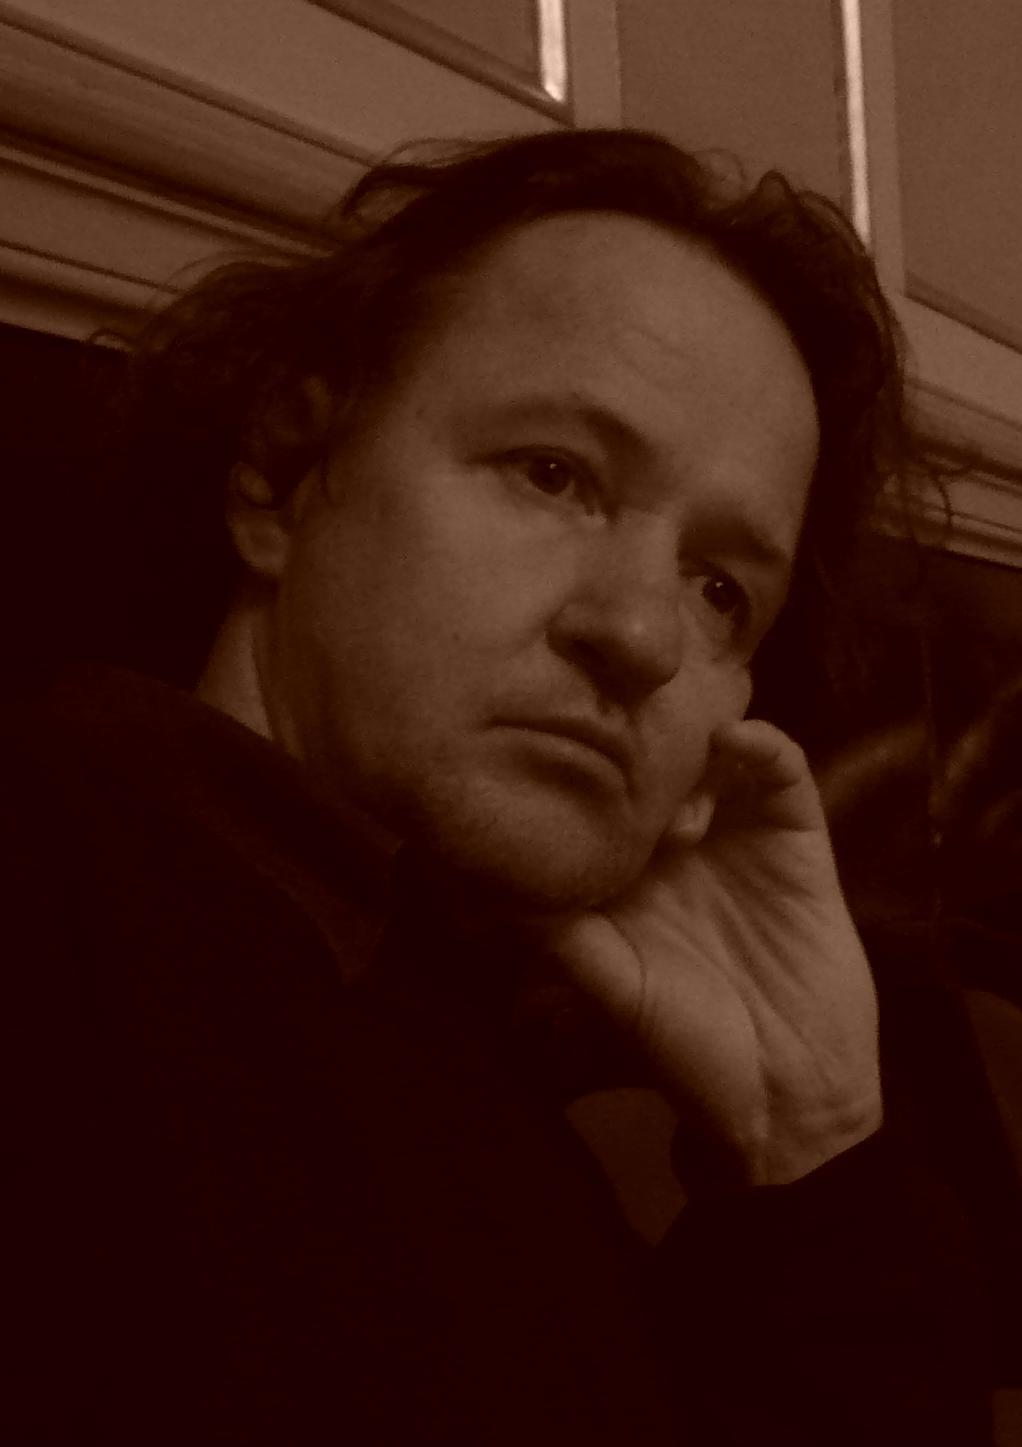 Daniel Micka, 2007